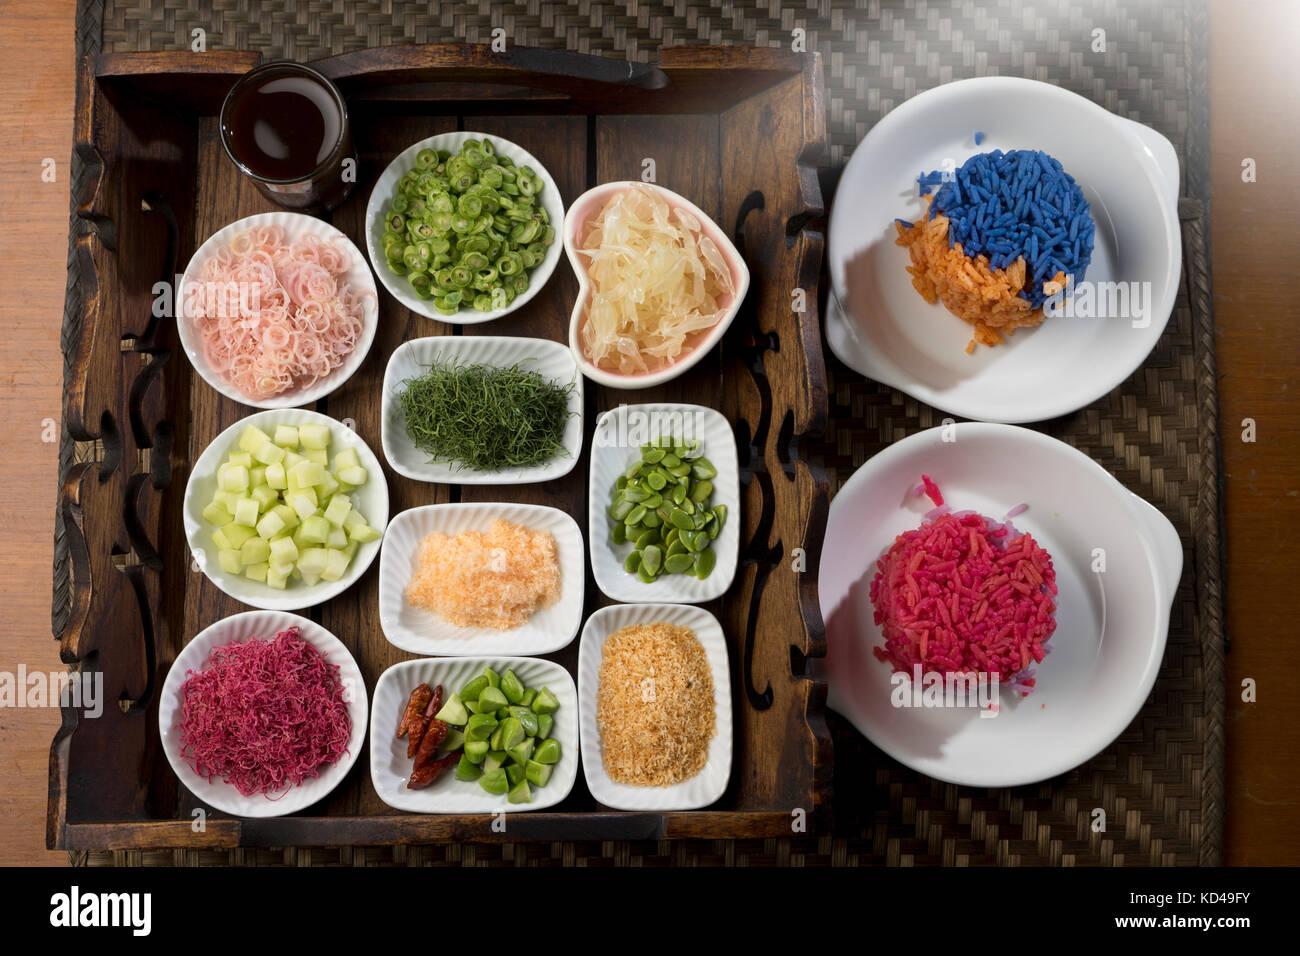 Pomelo salad stockfotos pomelo salad bilder alamy - Teller dekorieren ...